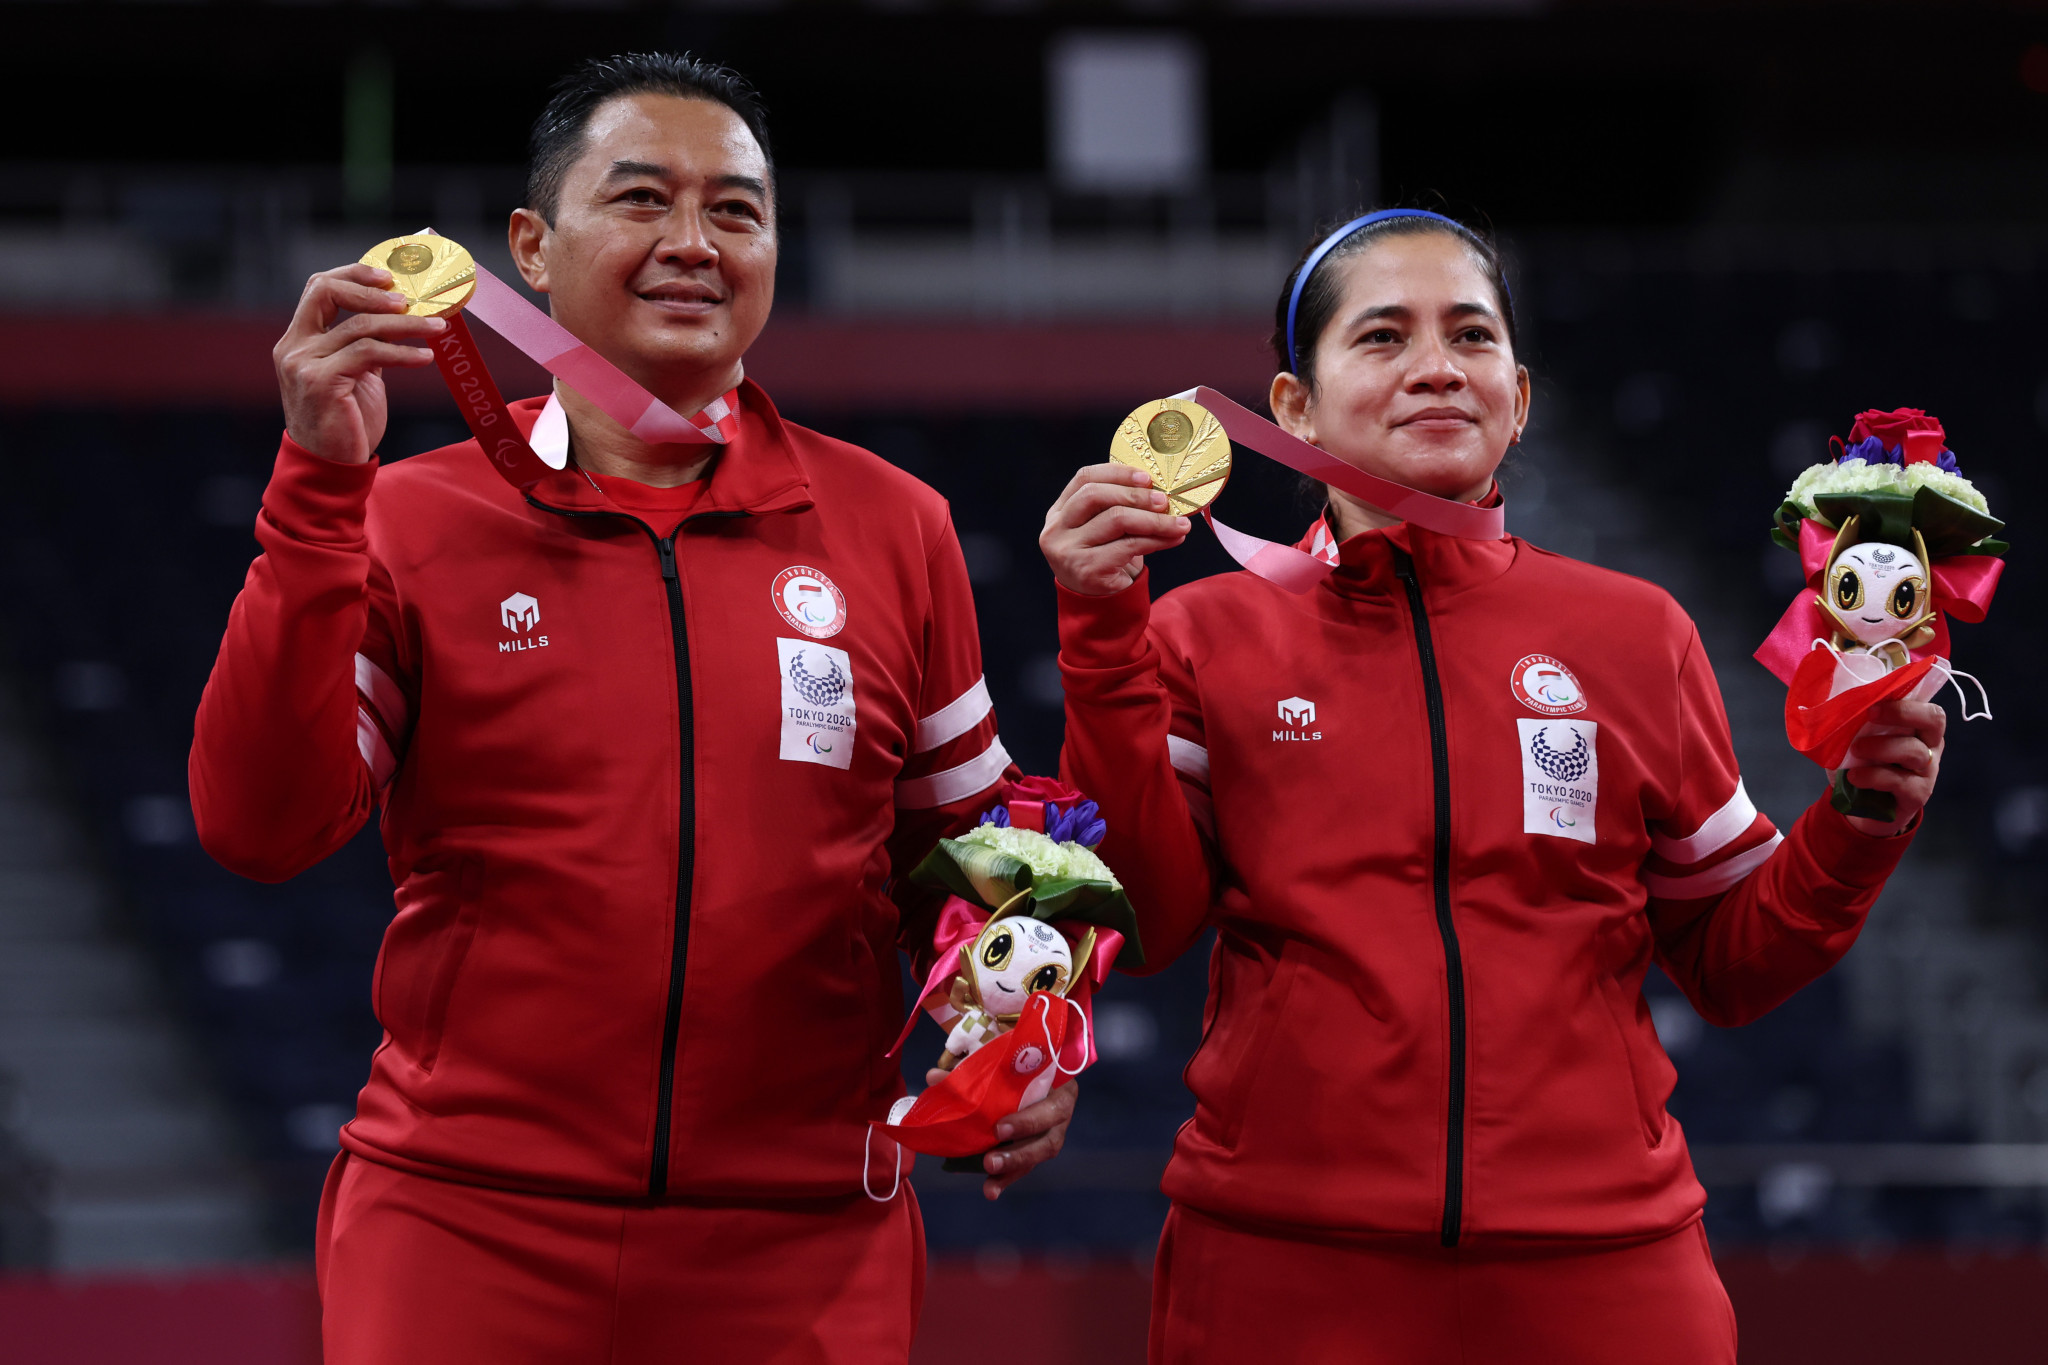 Indonesian Tokyo 2020 Paralympians to receive bonuses, President confirms